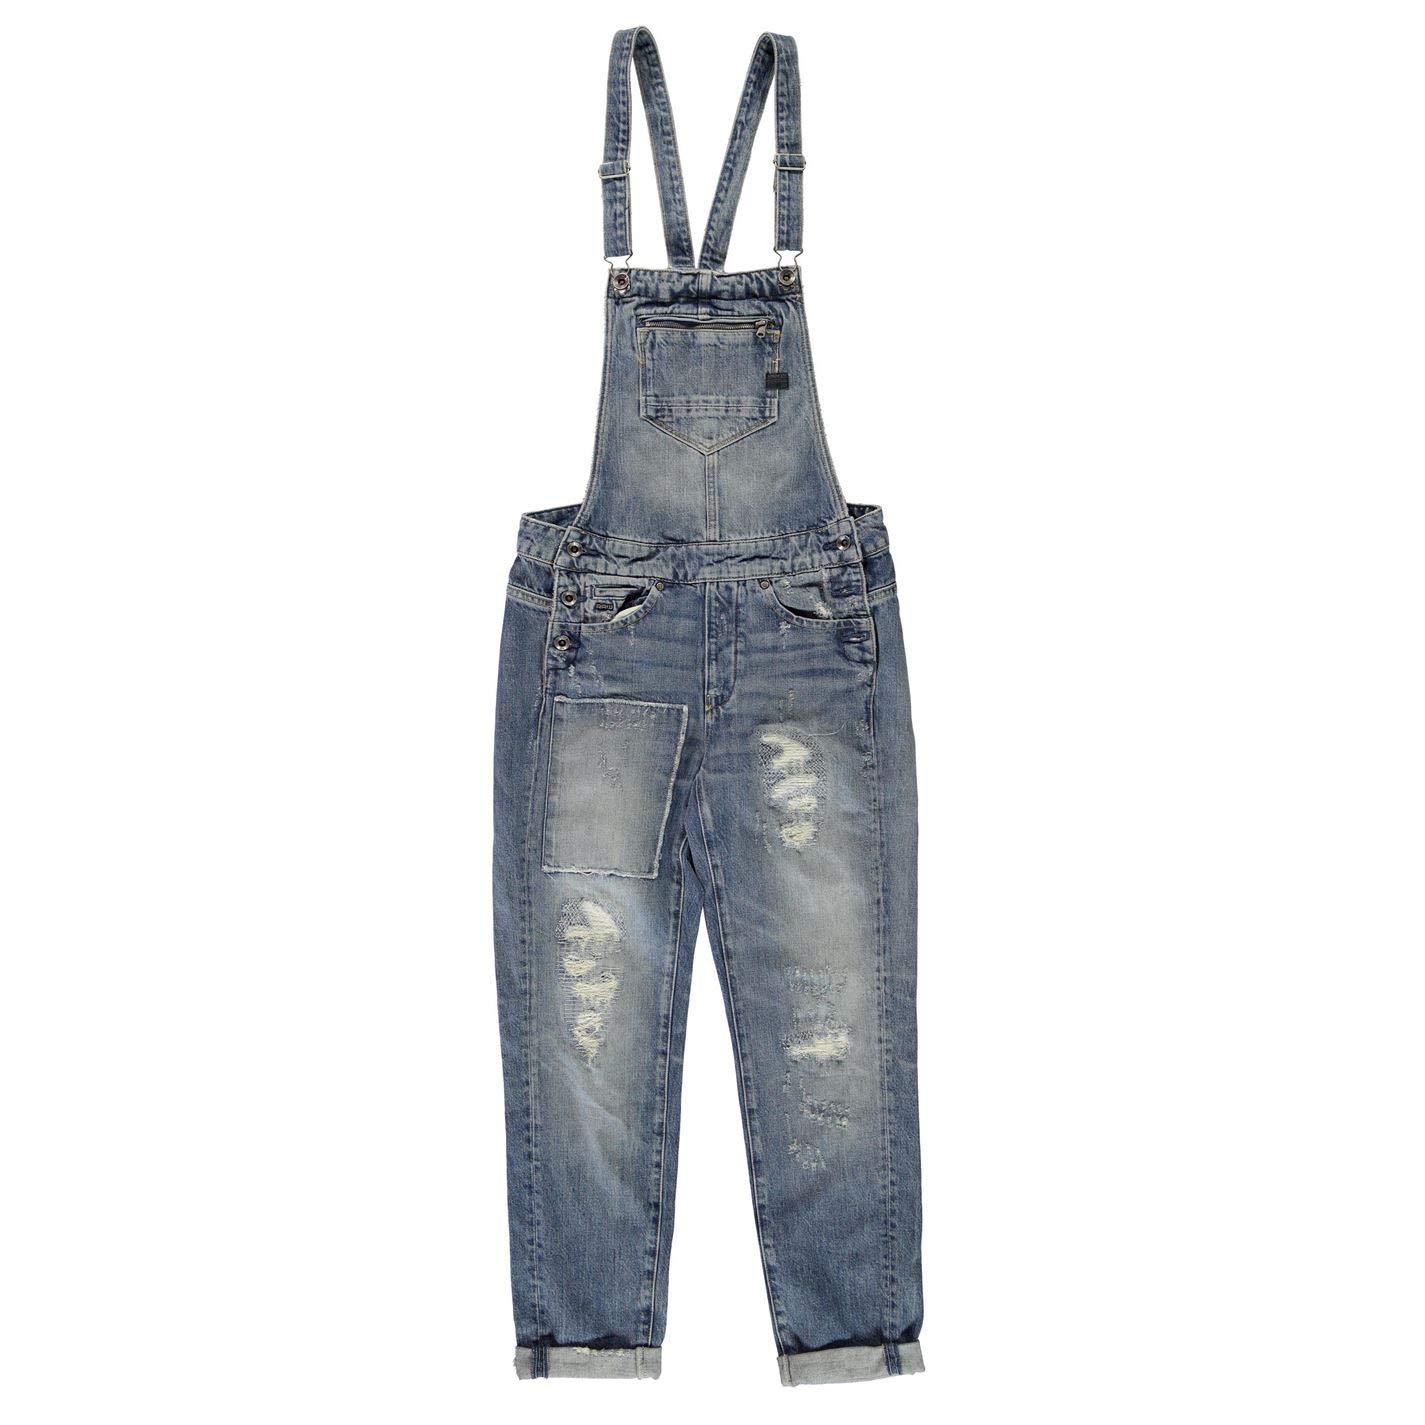 5af5ecc0f40d G Star Womens Midge Slim Salopette Jumpsuit Md AGD Rstrd 30 14 (L)   Amazon.co.uk  Clothing